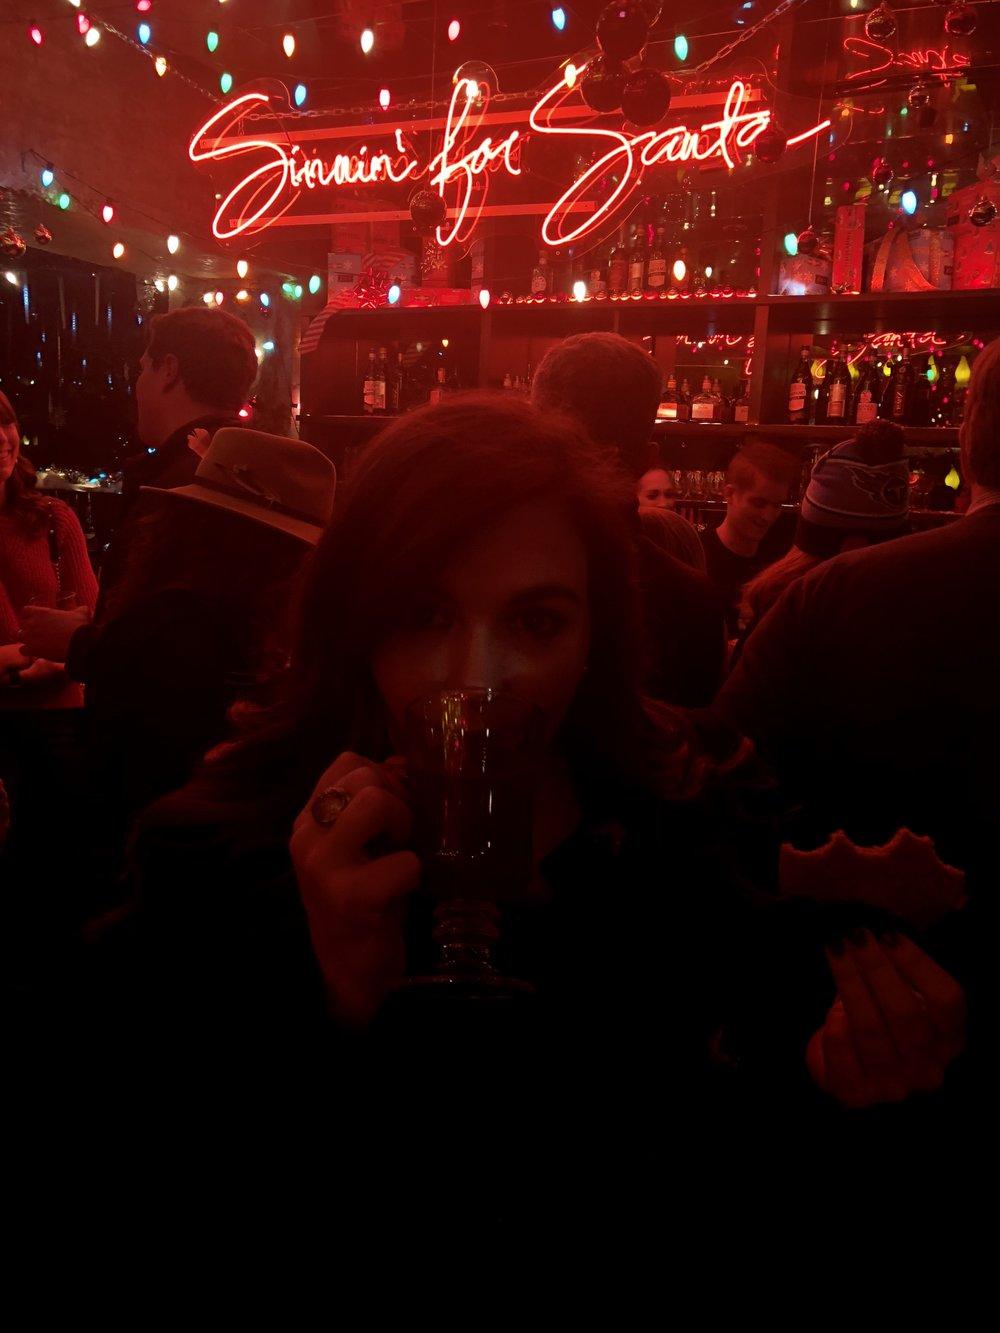 Enjoying a hot toddy during the holidays at the Hidden Bar Christmas pop-up, Miracle.